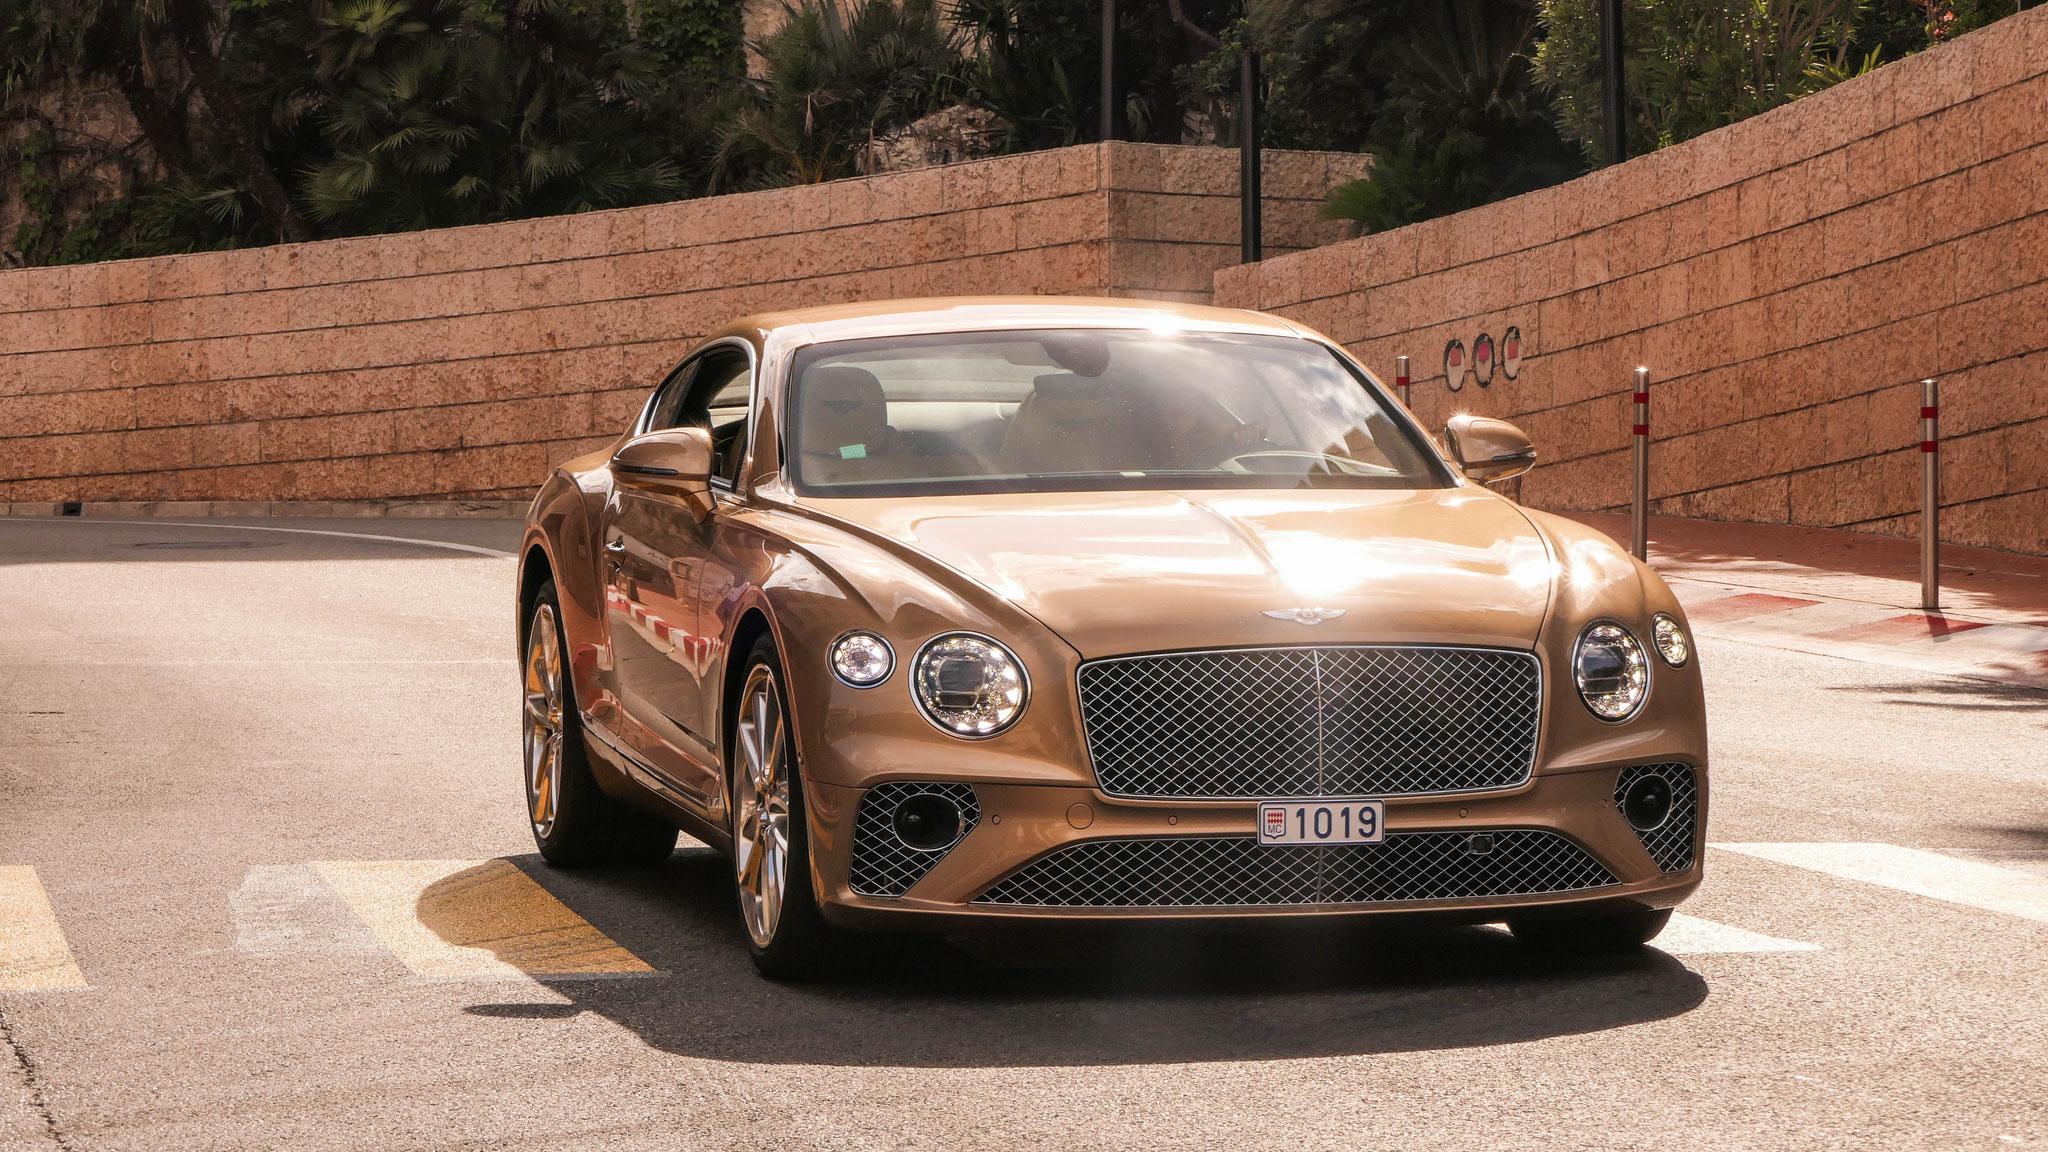 Bentley Continental GT - 1019 (MC)